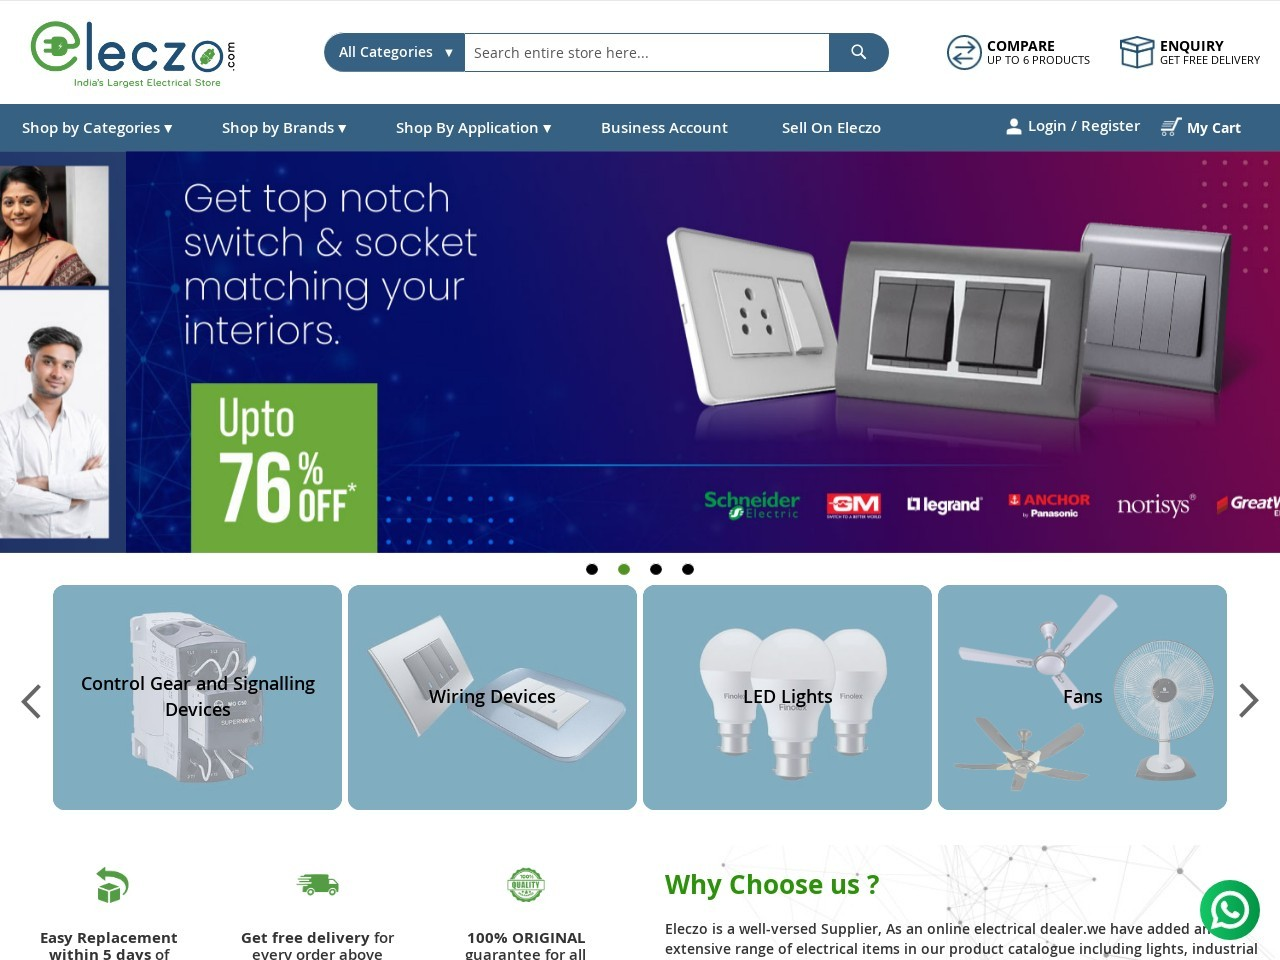 Buy Siemens 3RV2011-1JA15 10 Amp MPCB at Online |Eleczo.com